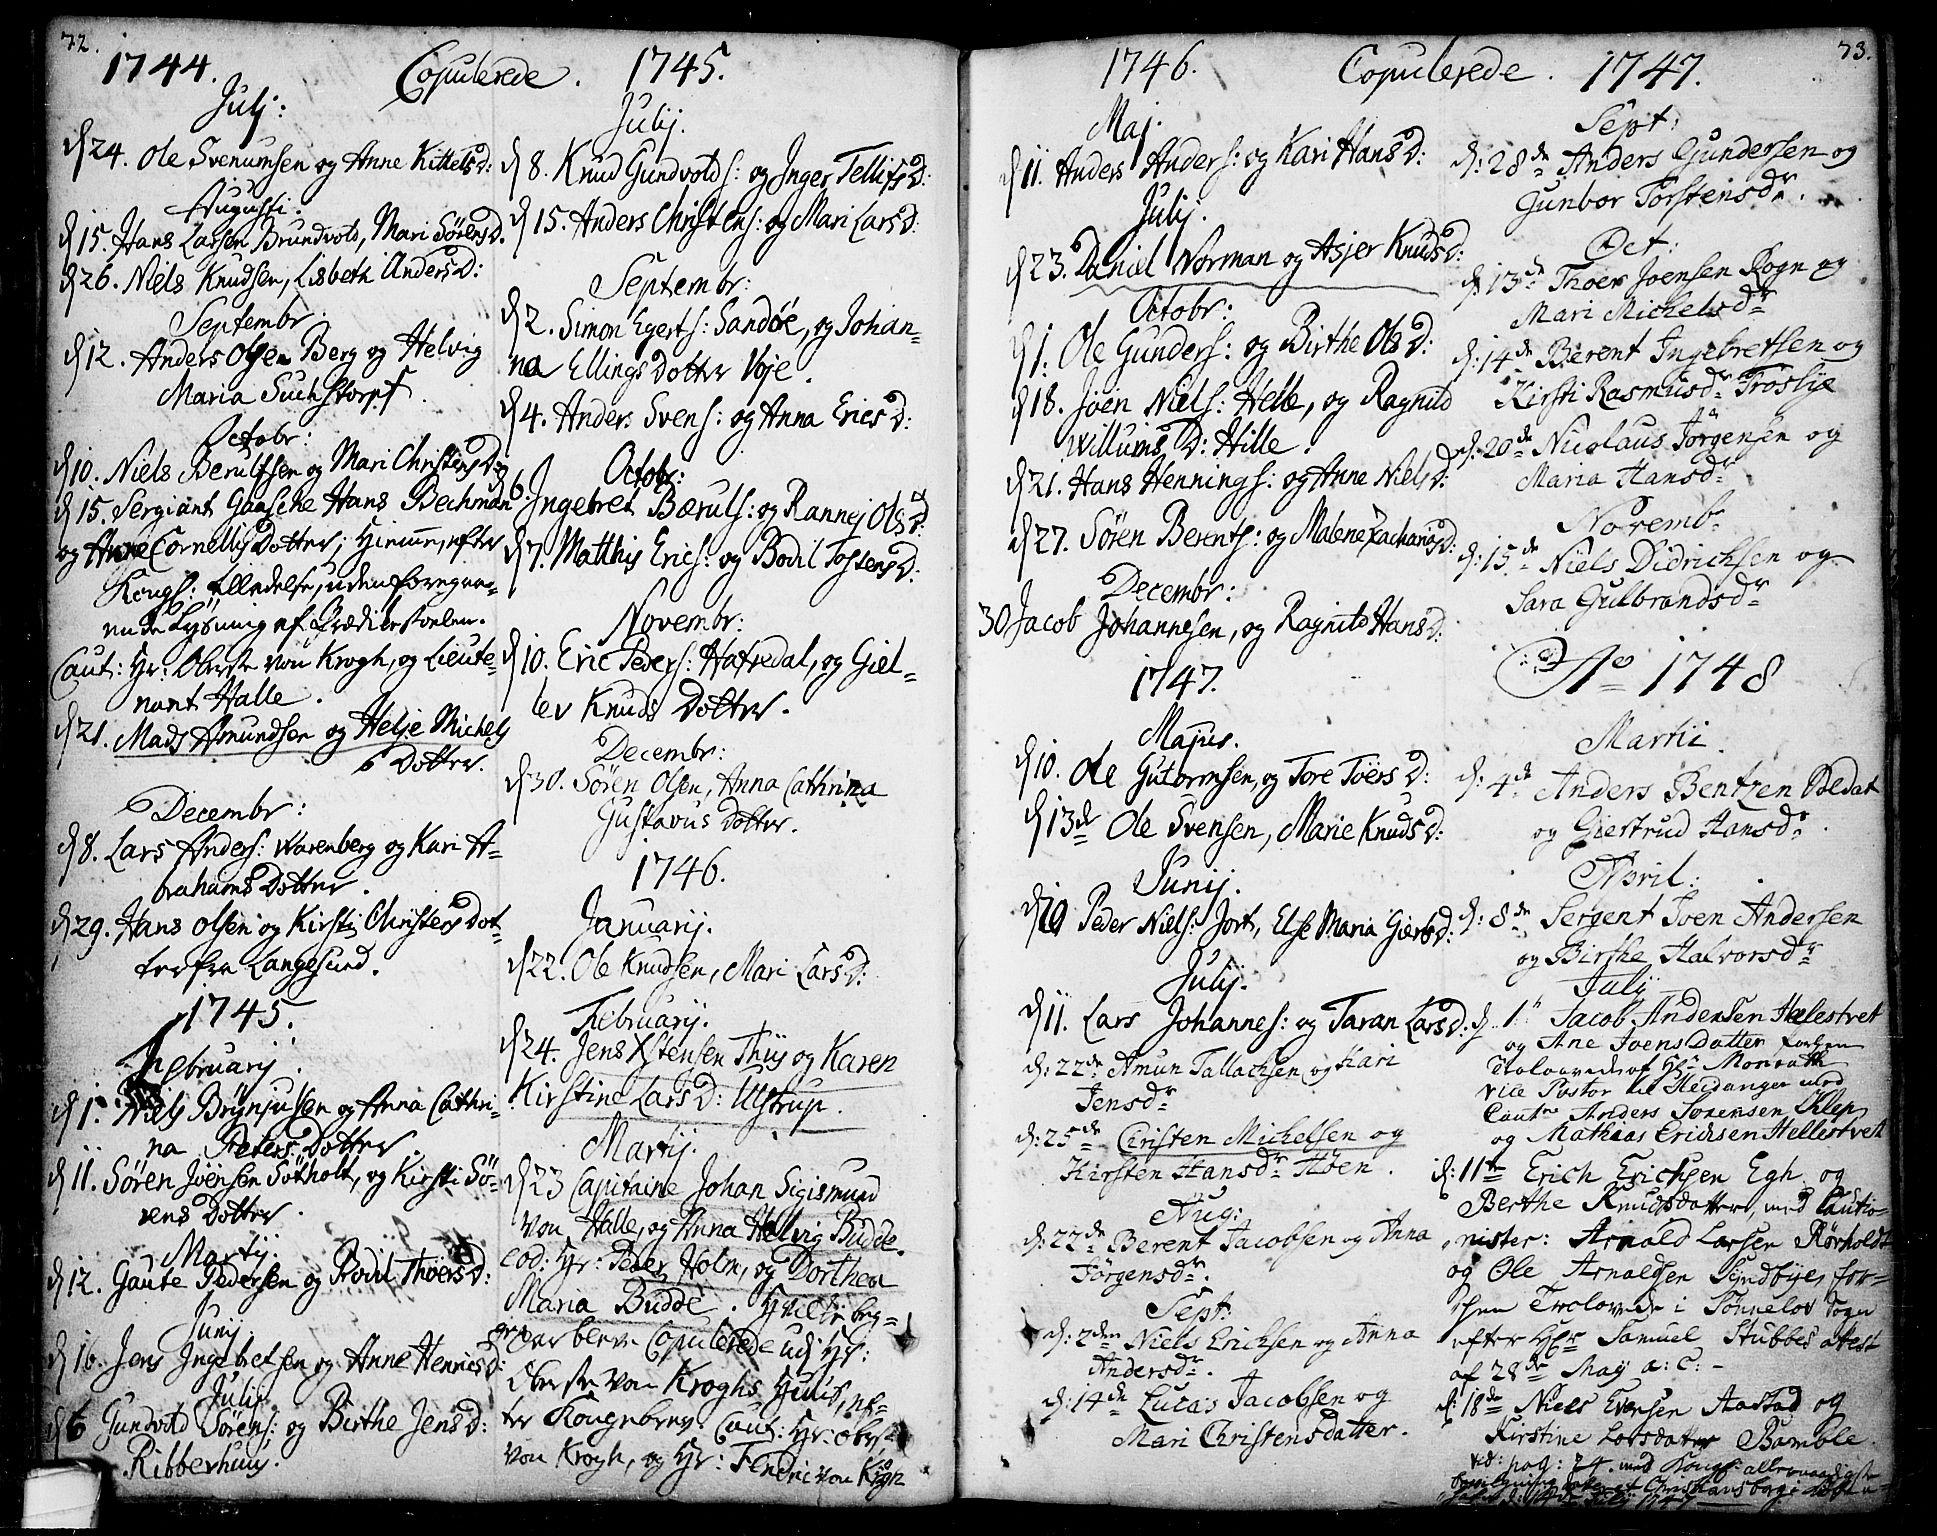 SAKO, Bamble kirkebøker, F/Fa/L0001: Ministerialbok nr. I 1, 1702-1774, s. 72-73